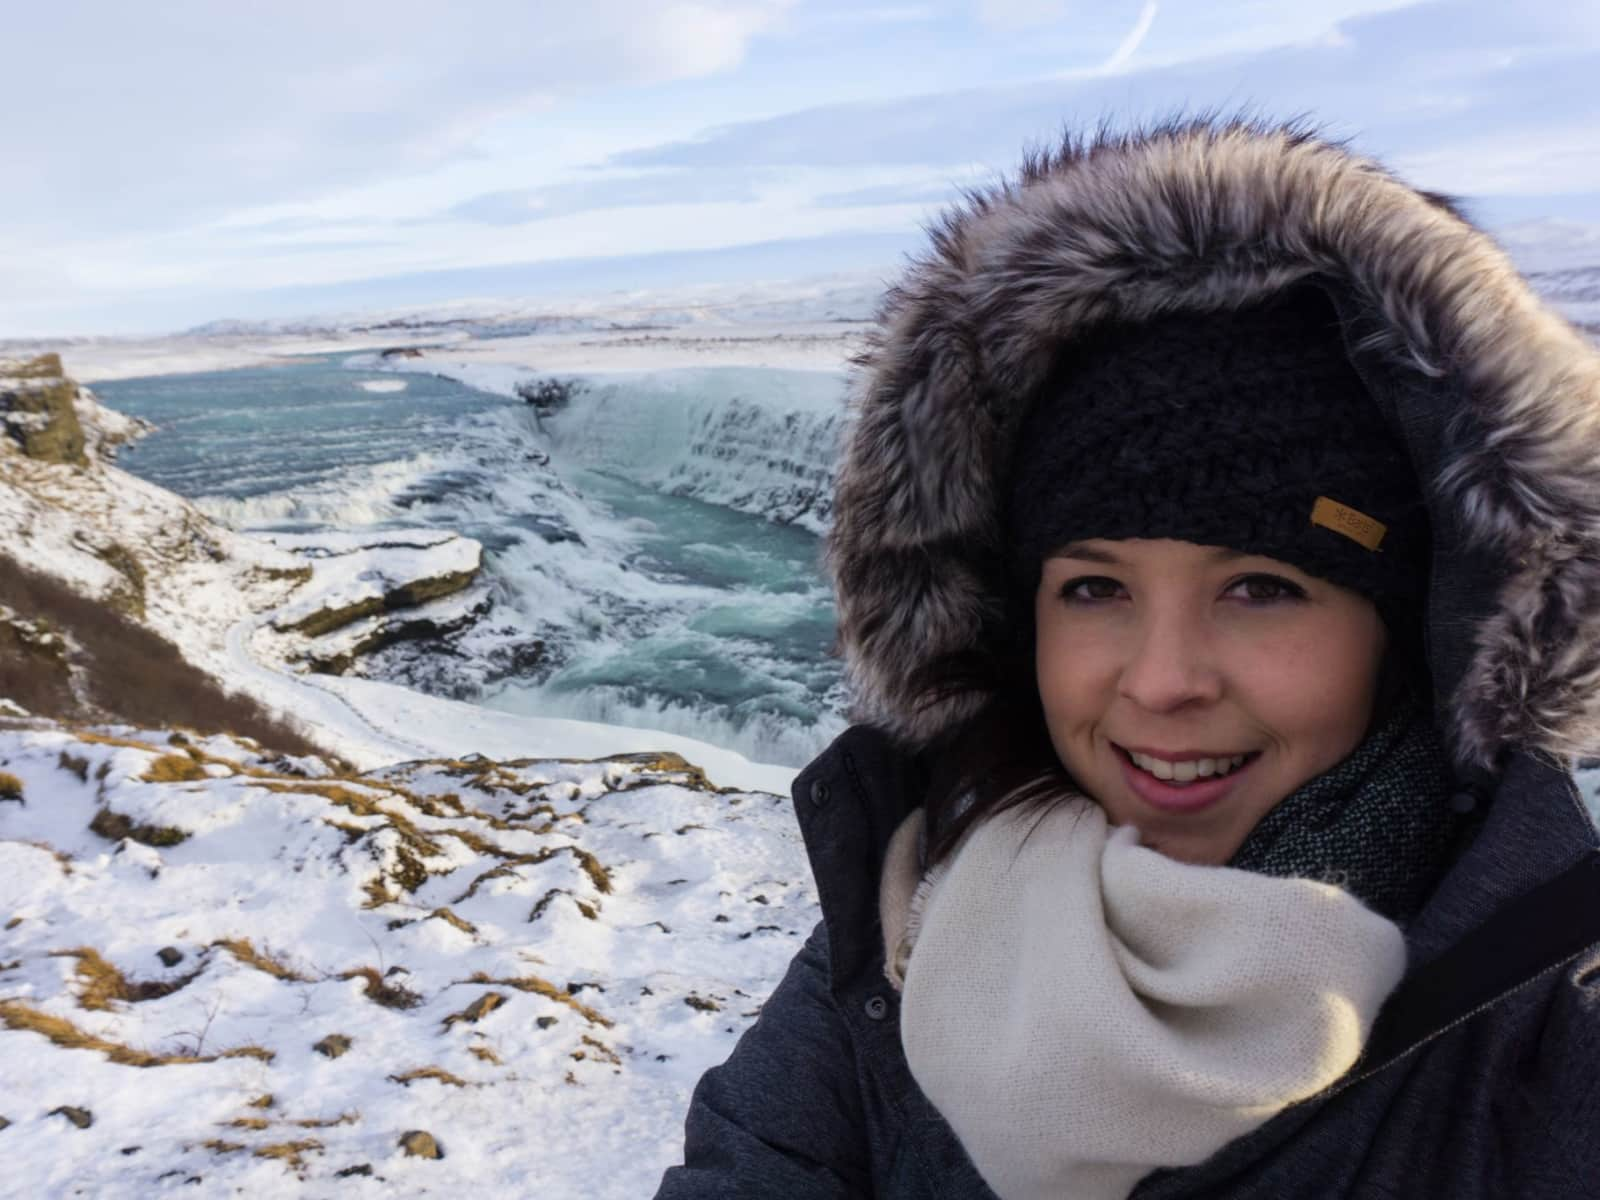 Phillipa from London, United Kingdom